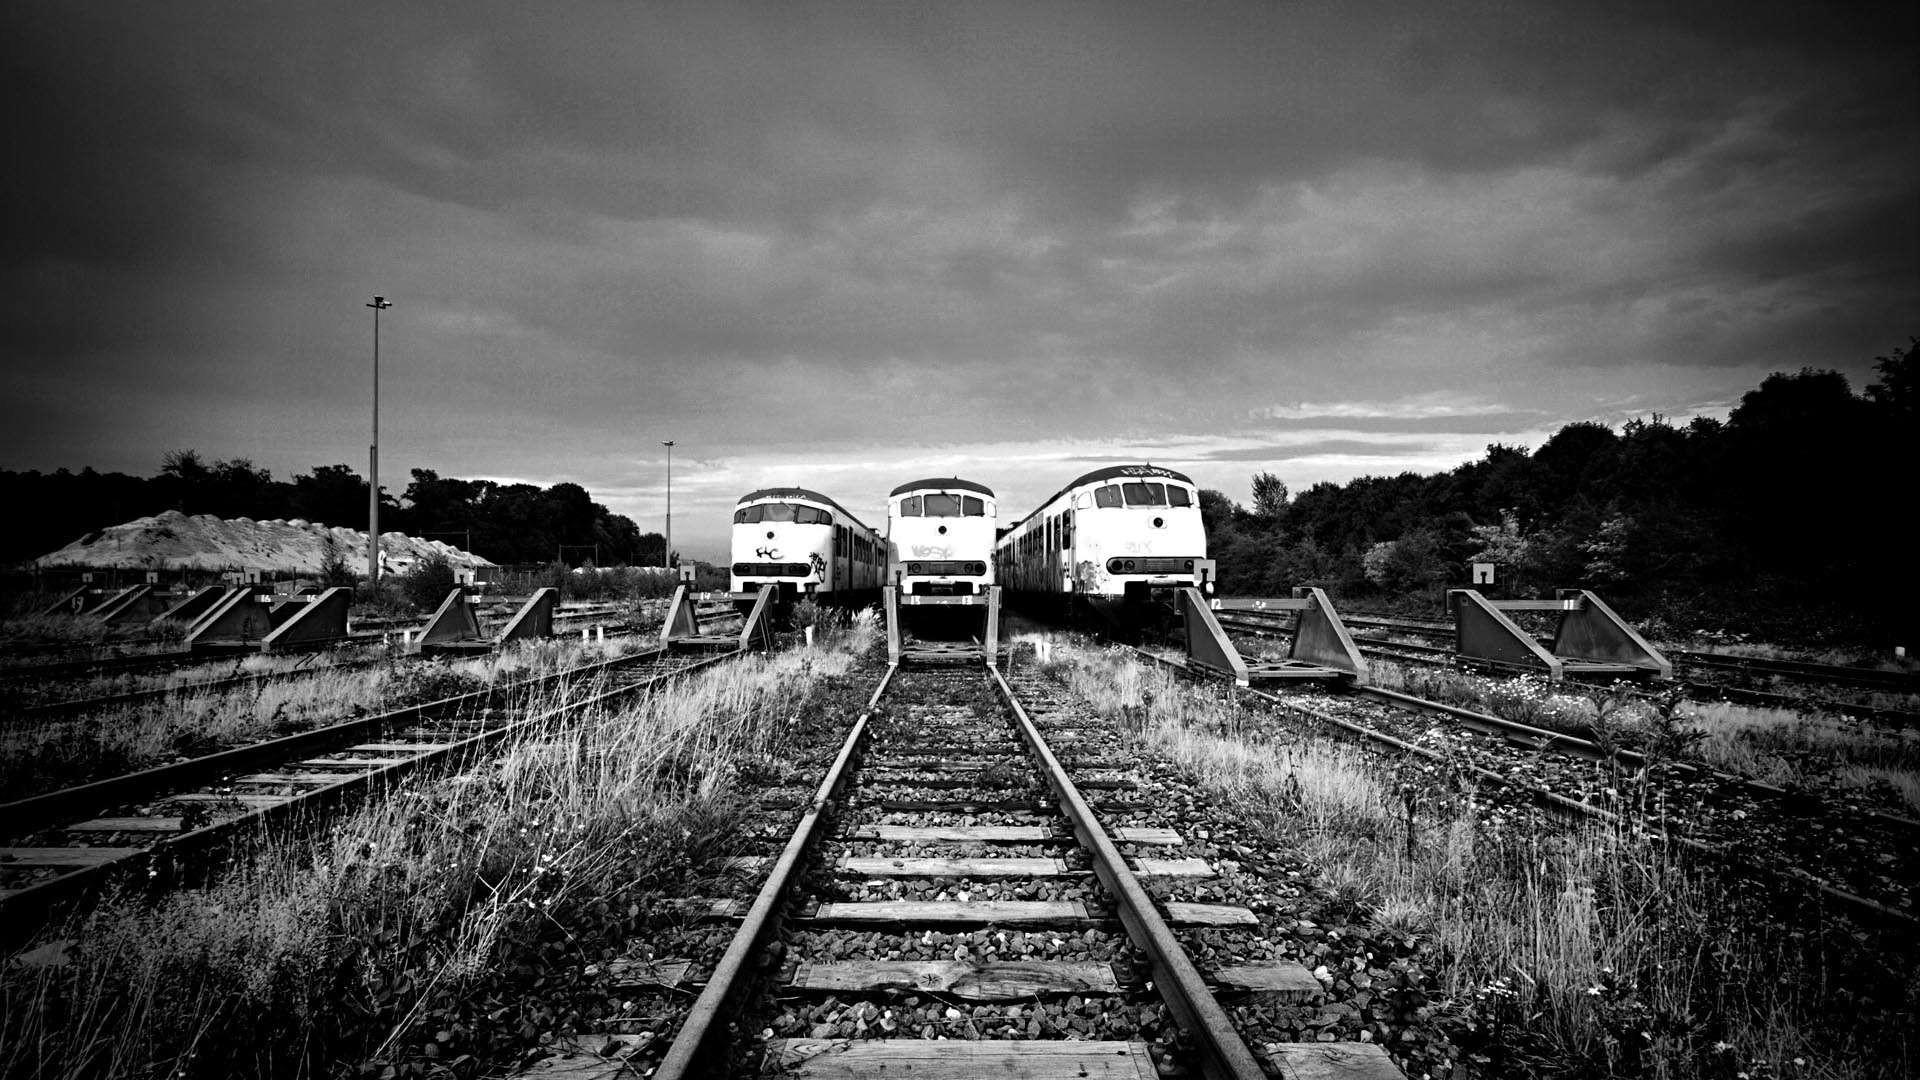 Dutch Railroad Tracks and Trains Dutch Railroad Tracks and Trains HD  Wallpaper